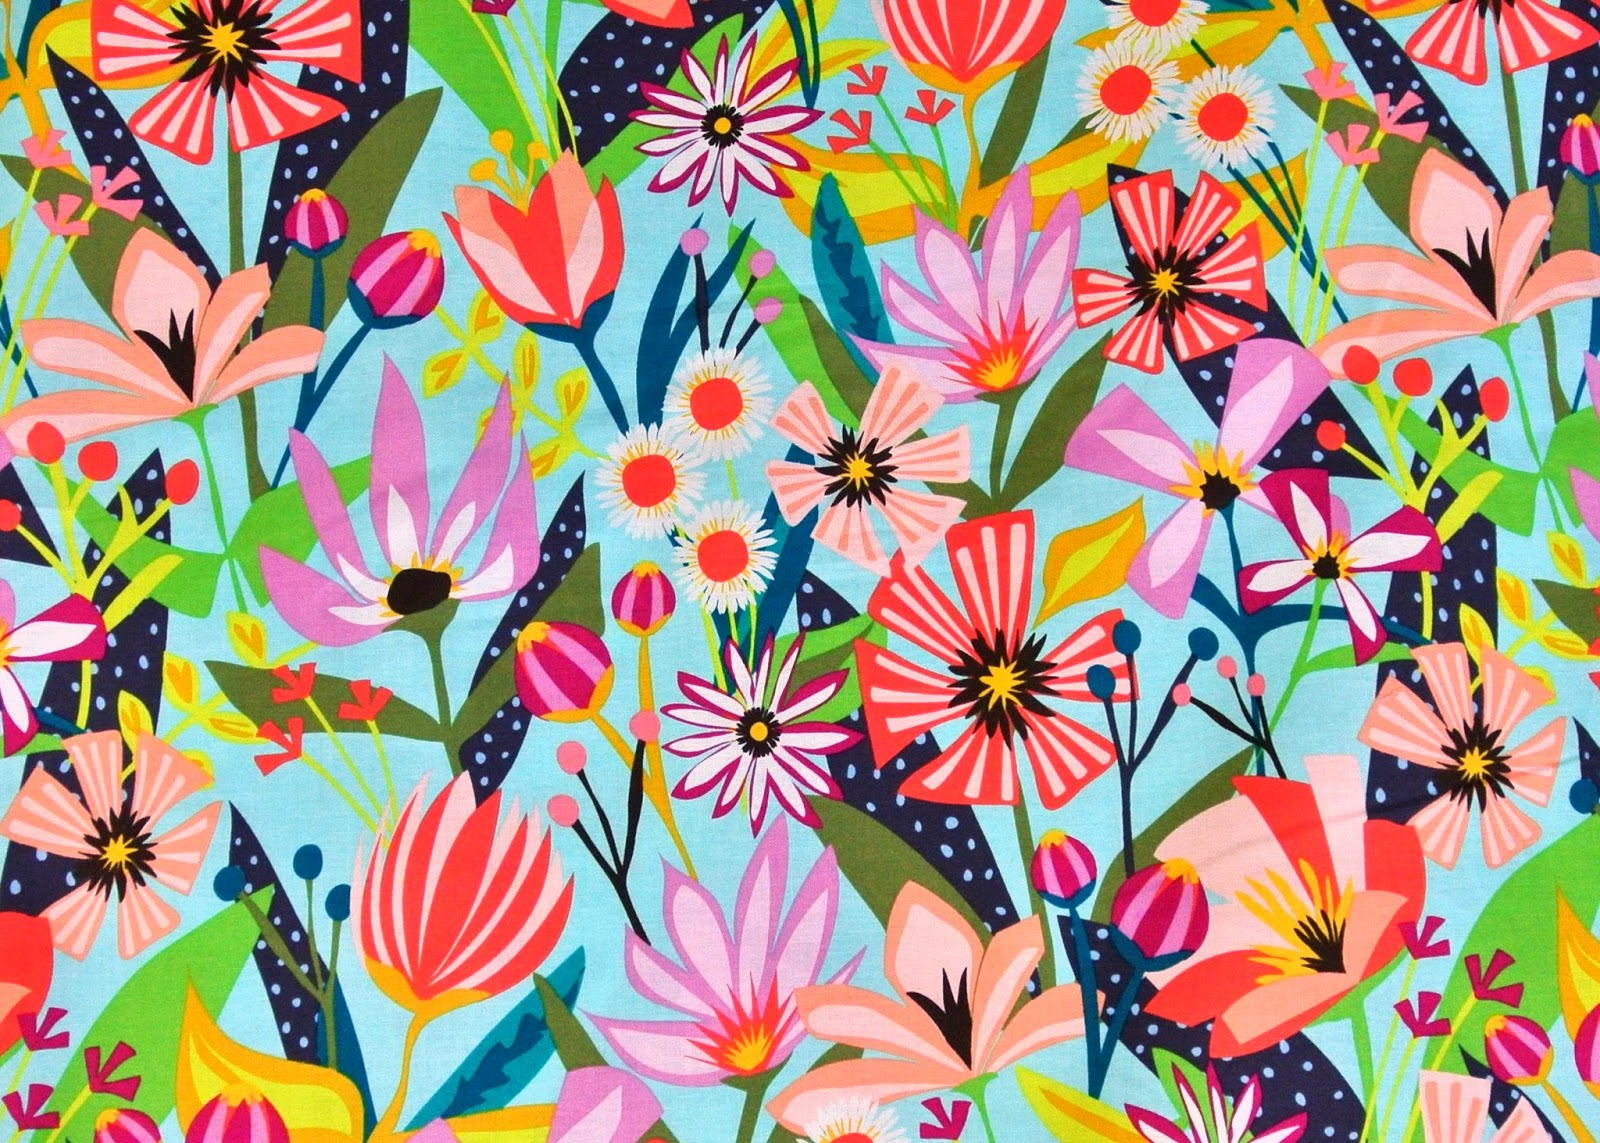 Bright Floral Prints